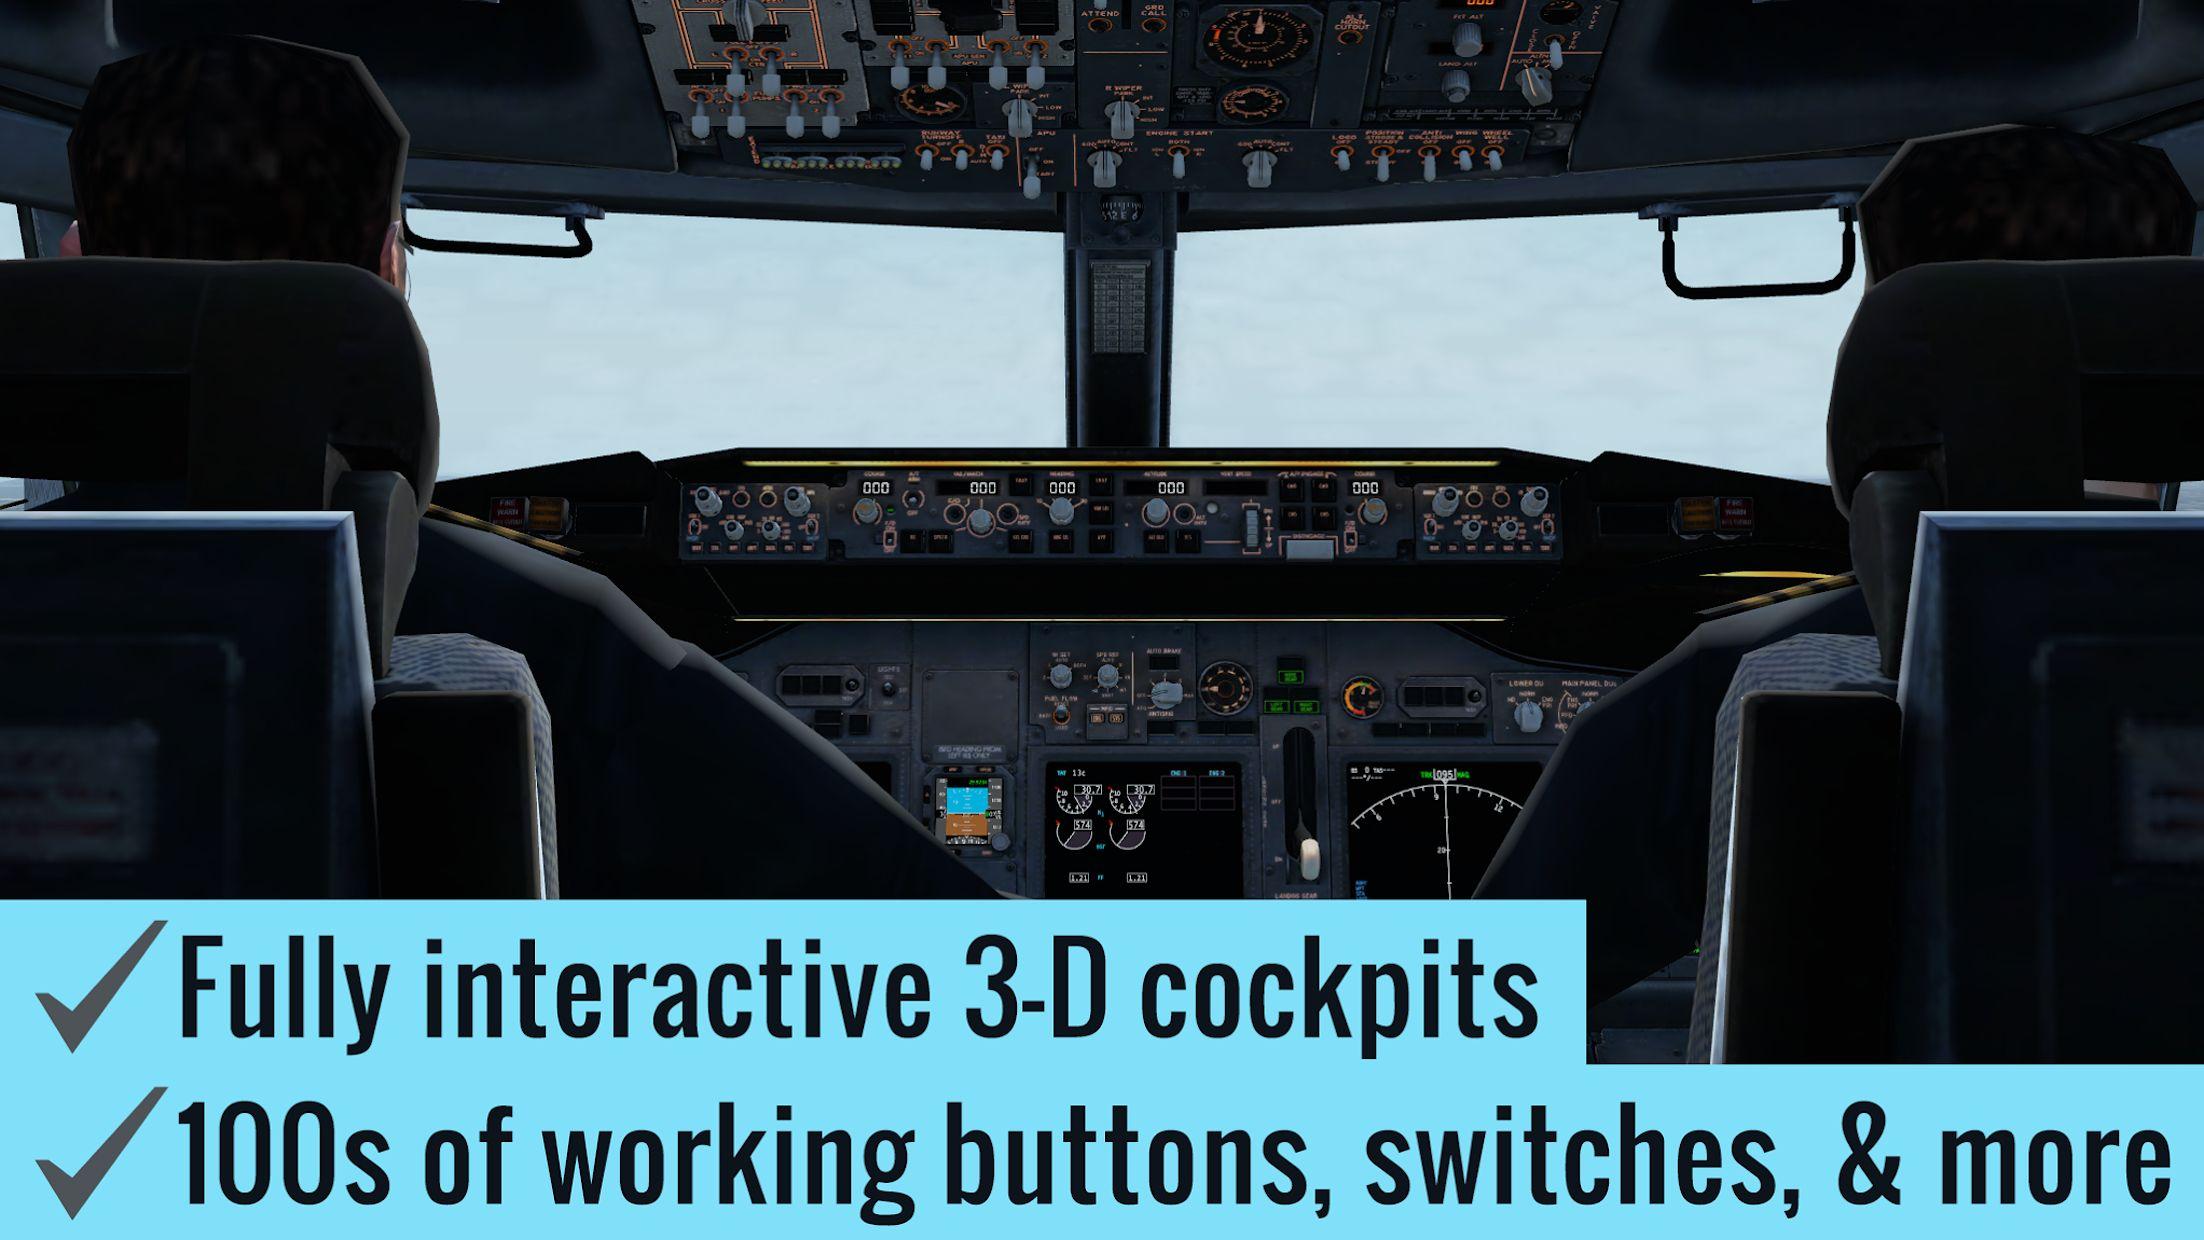 X-Plane 10 Flight Simulator 游戏截图2